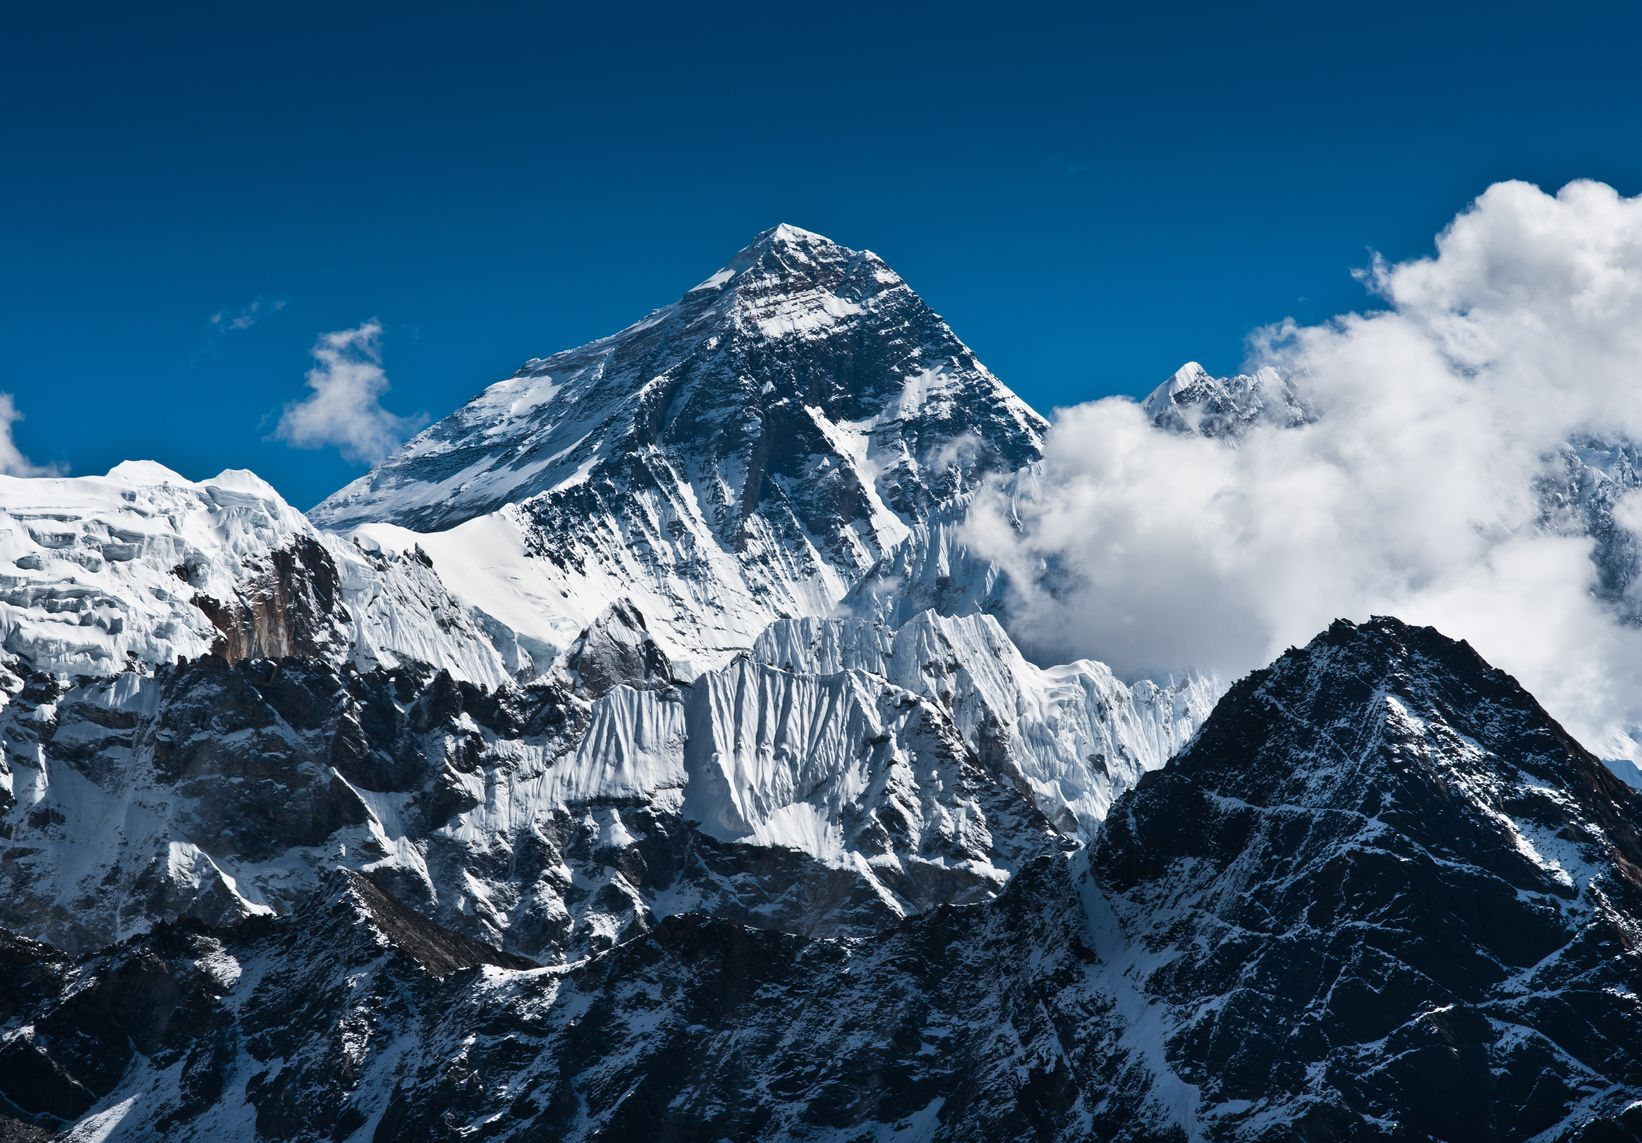 39 Mount Everest Hd Wallpaper On Wallpapersafari